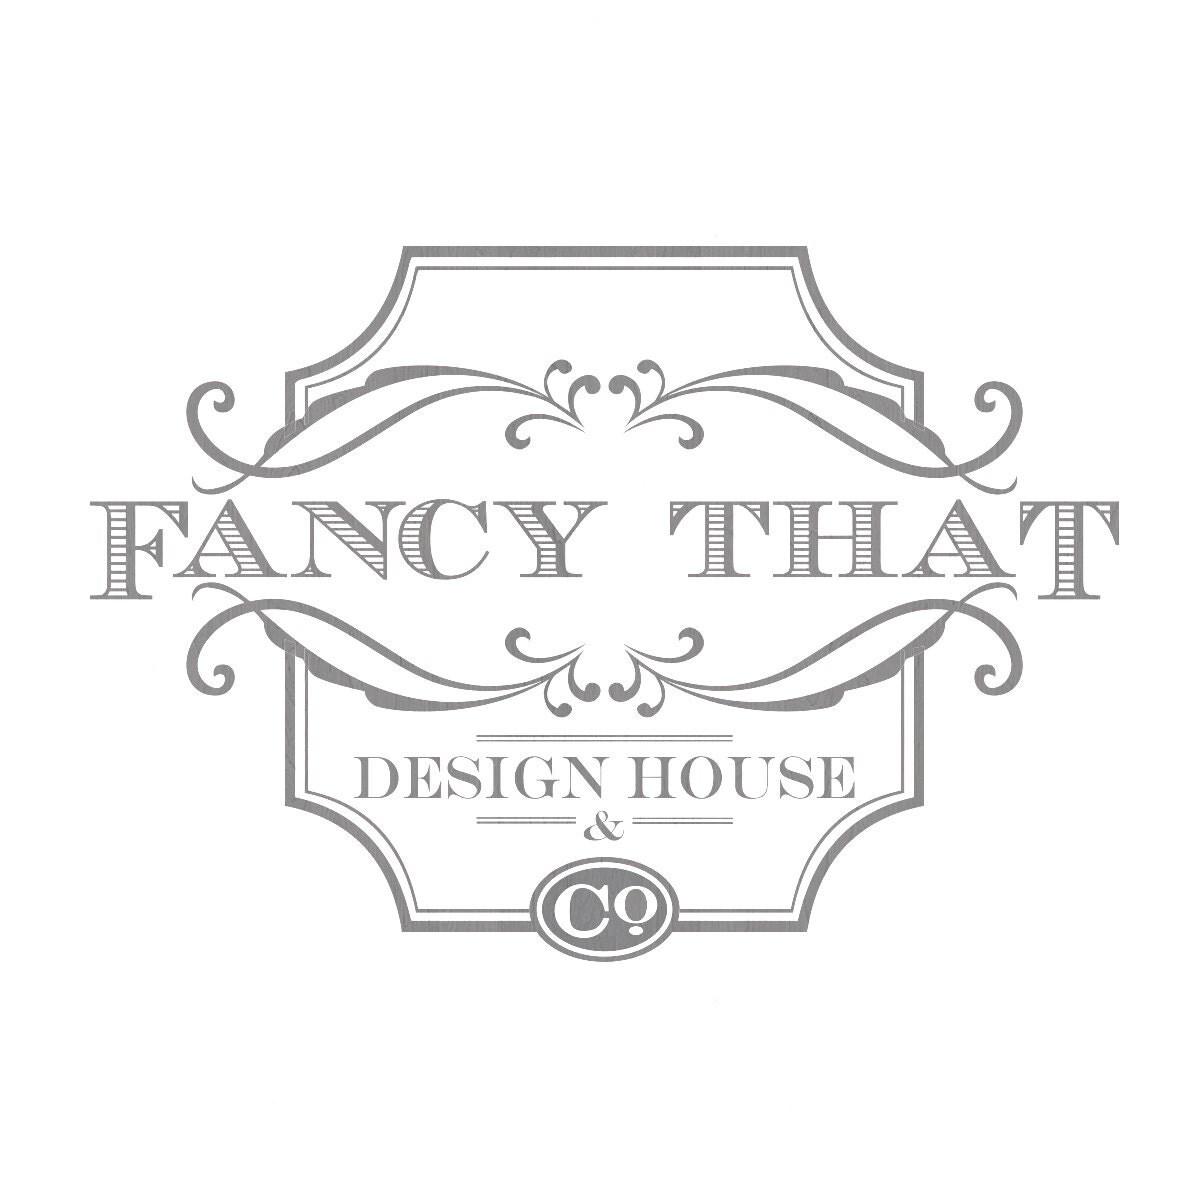 Inspirational & Uplifting Art Prints For By FancyThatDesignHouse